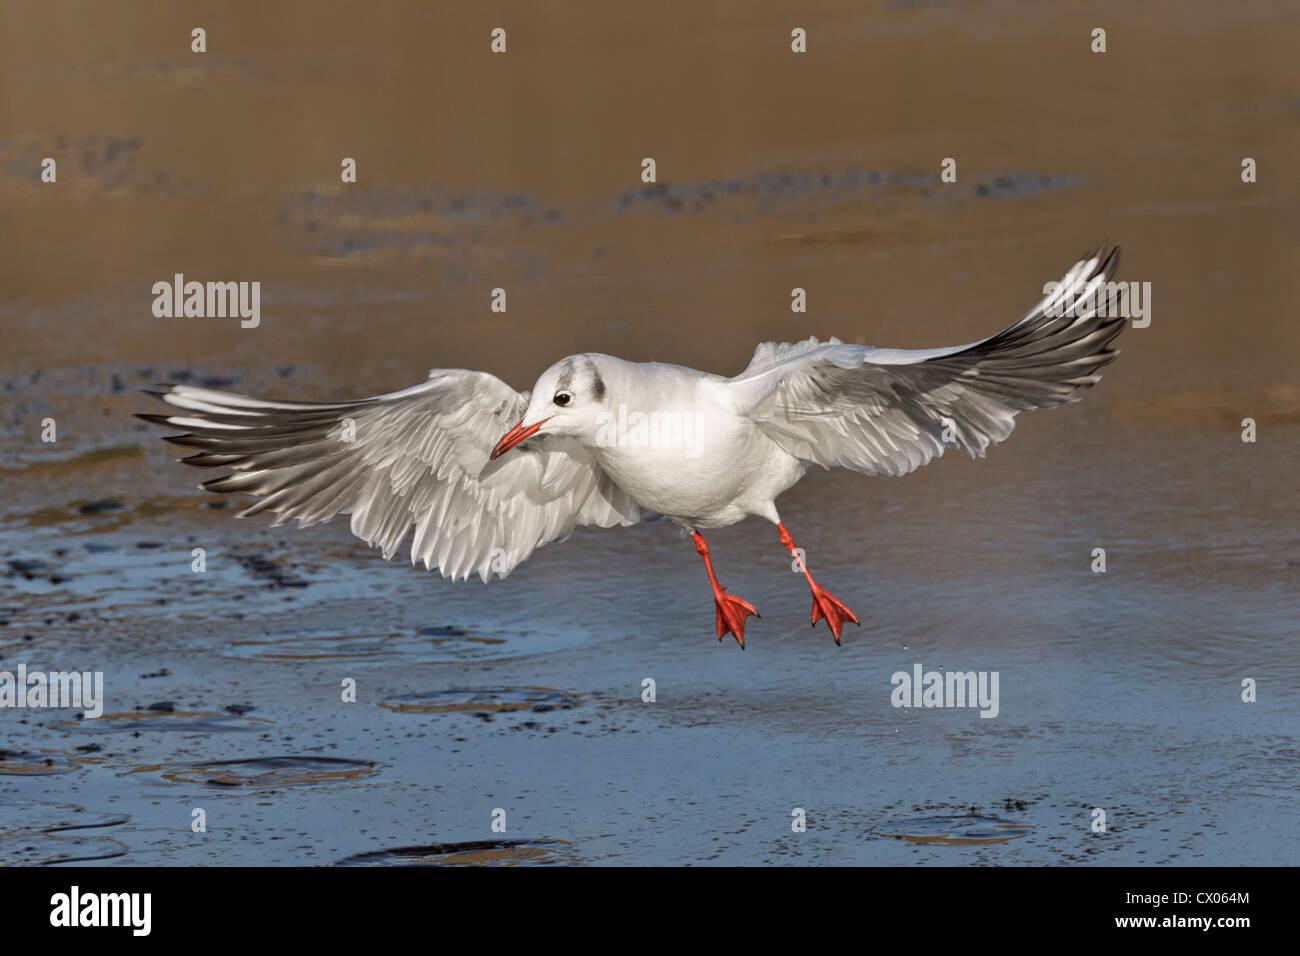 Black headed Gull, Larus ridibundus, Adult winter plumage bird taking off from an icy pool, Norfolk, December Stock Photo